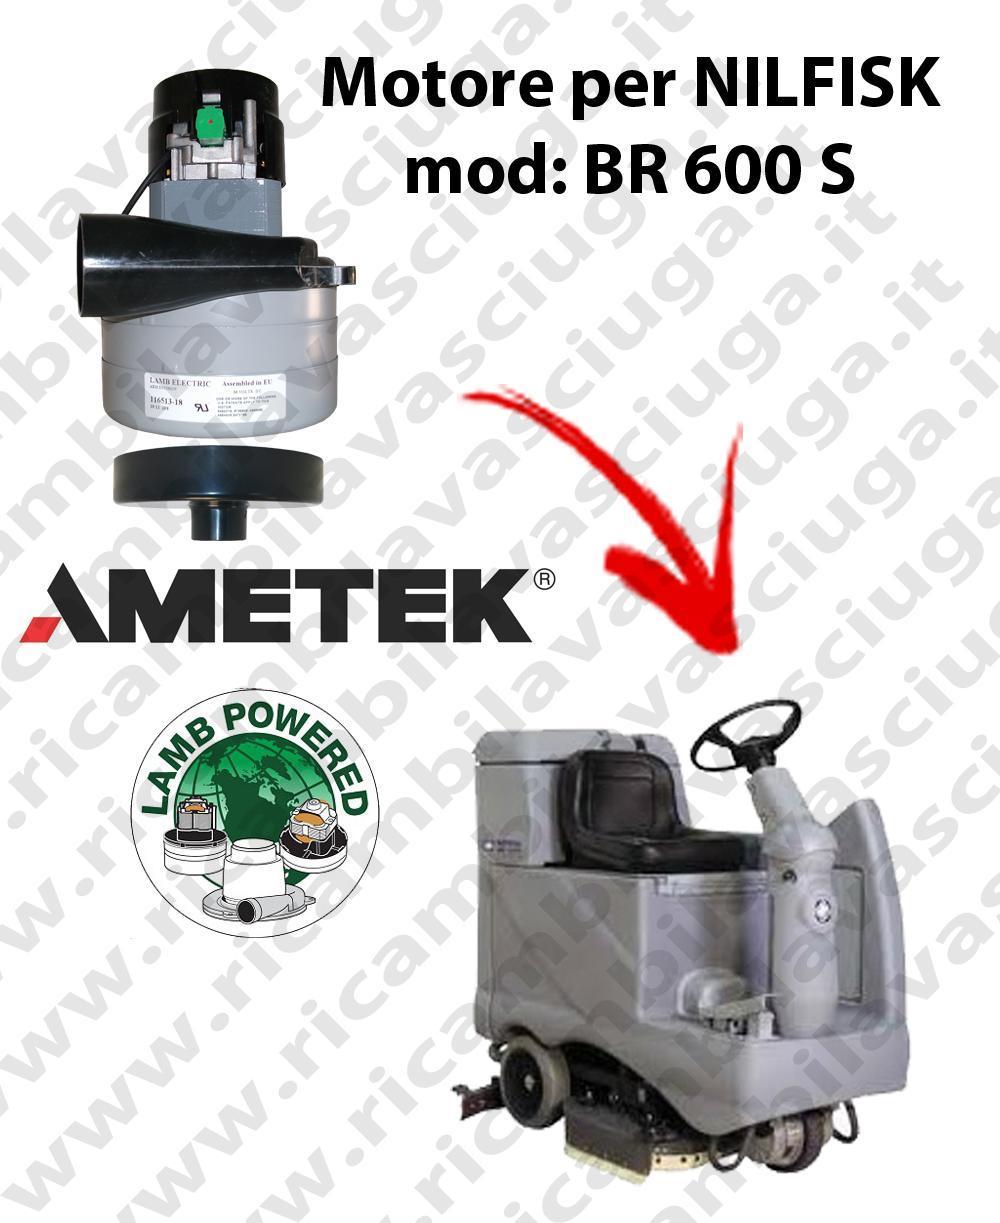 BR 600 S Vacuum motor LAMB AMETEK for scrubber dryer NILFISK